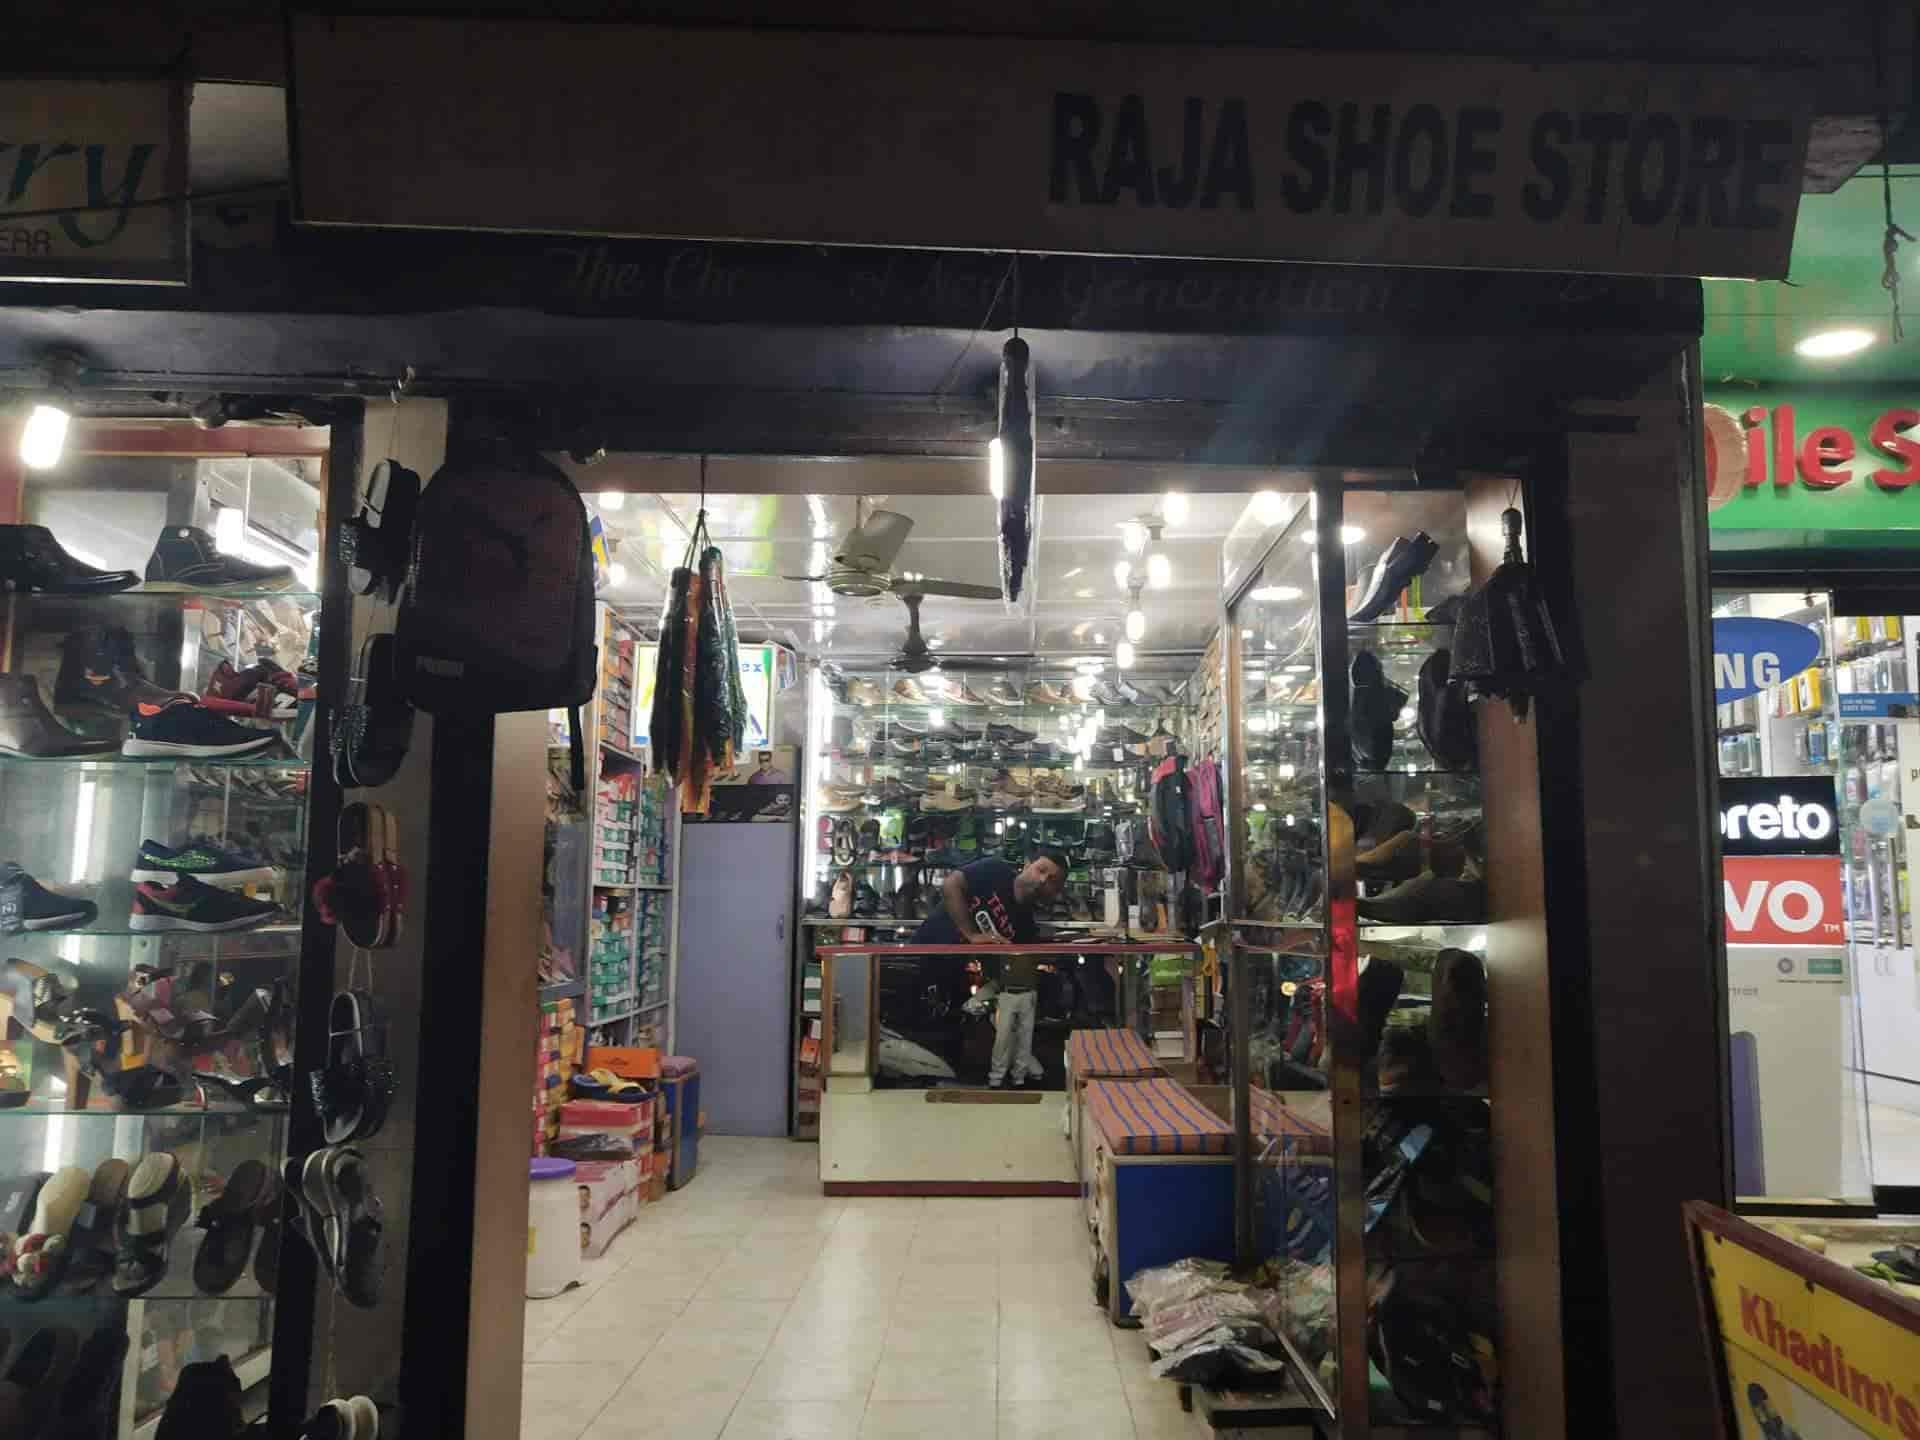 1.99 shoe store near me